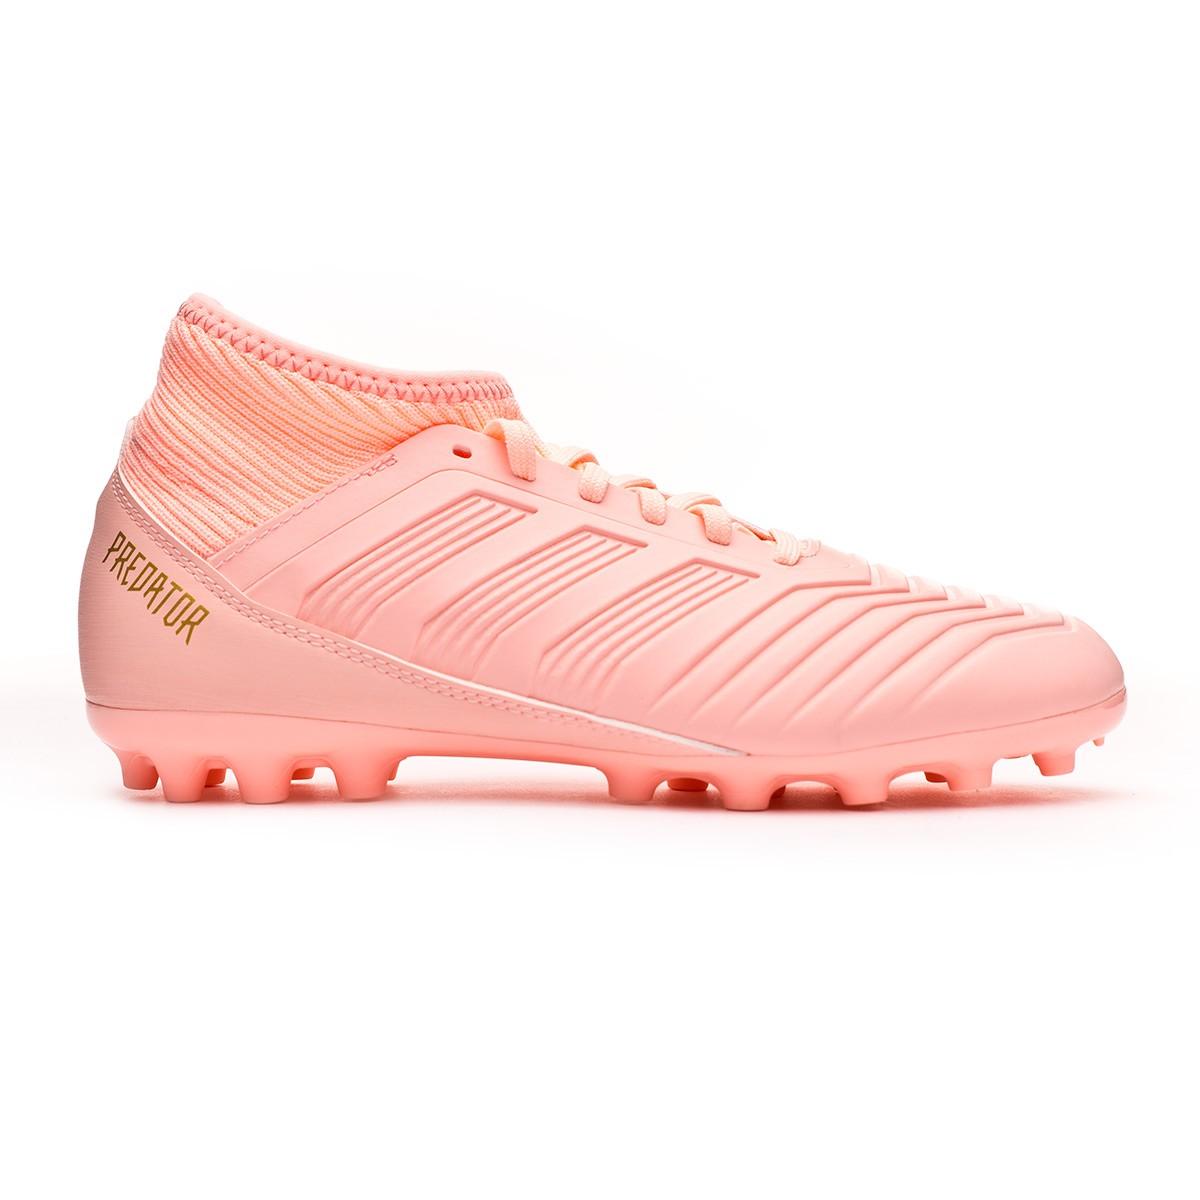 ... denmark boot adidas kids predator 18.3 ag clear orange trace pink leaked  f719d 526c5 643f30814f0ff